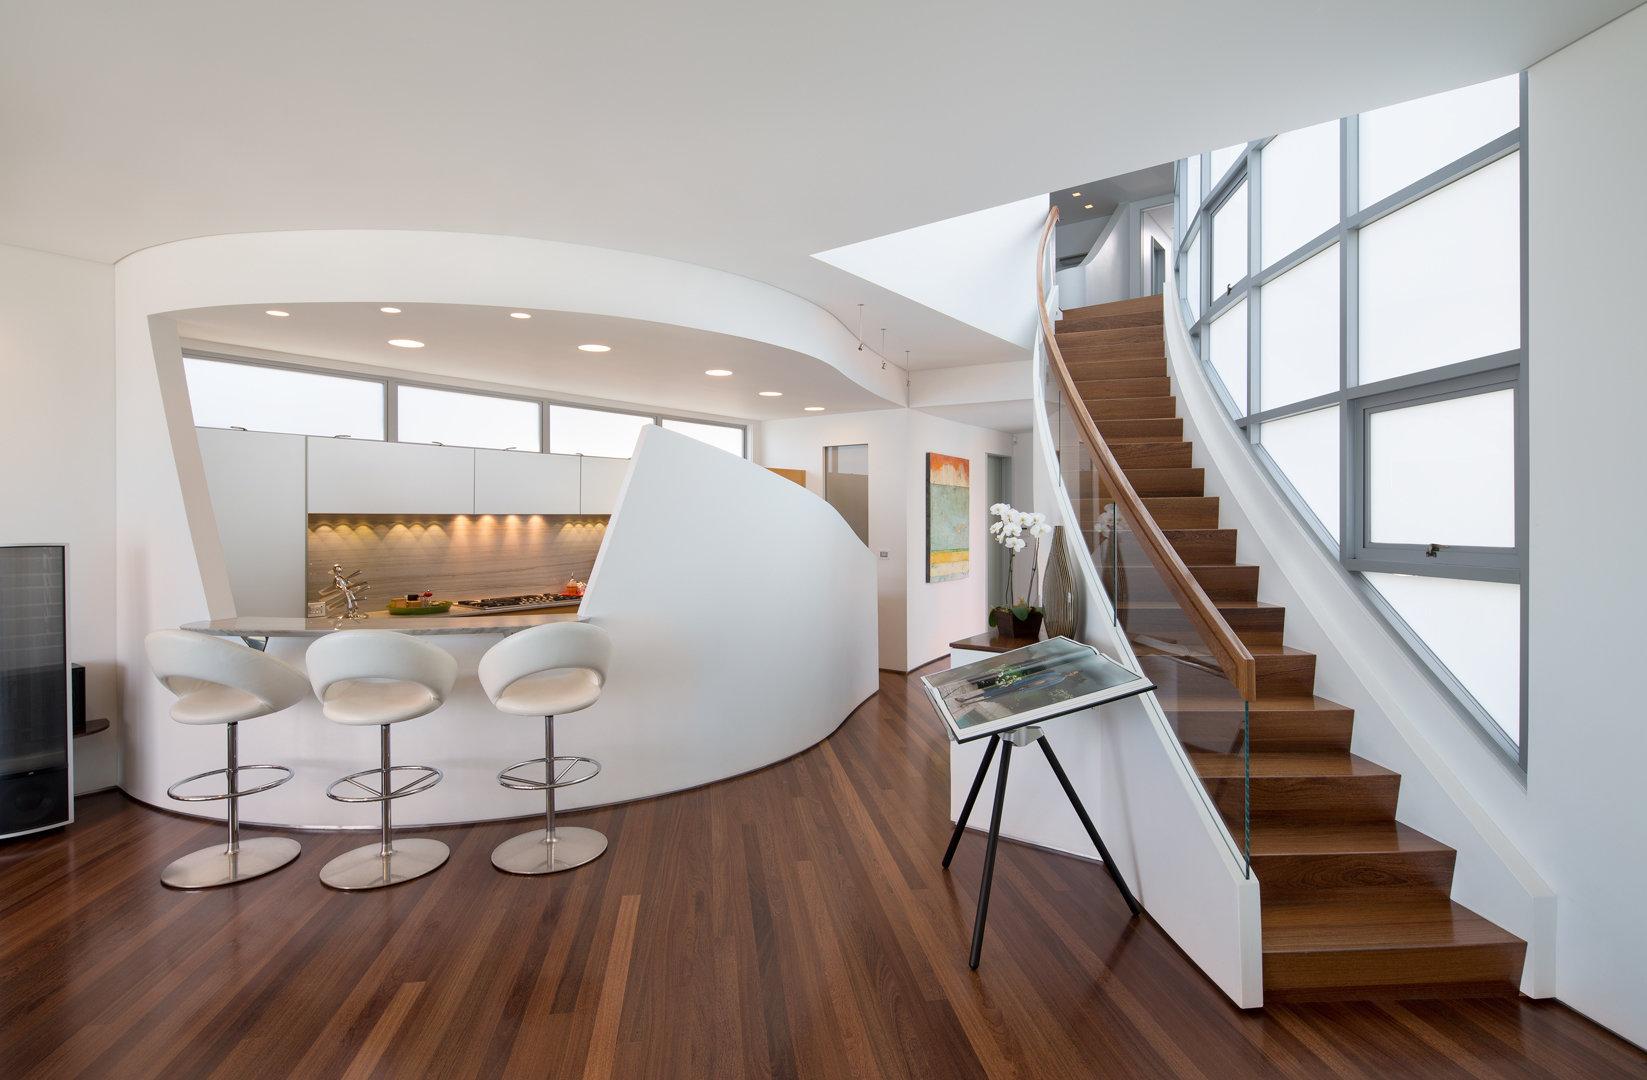 Lena_Crescentini_Kitchen-Stairs_WEB.jpg